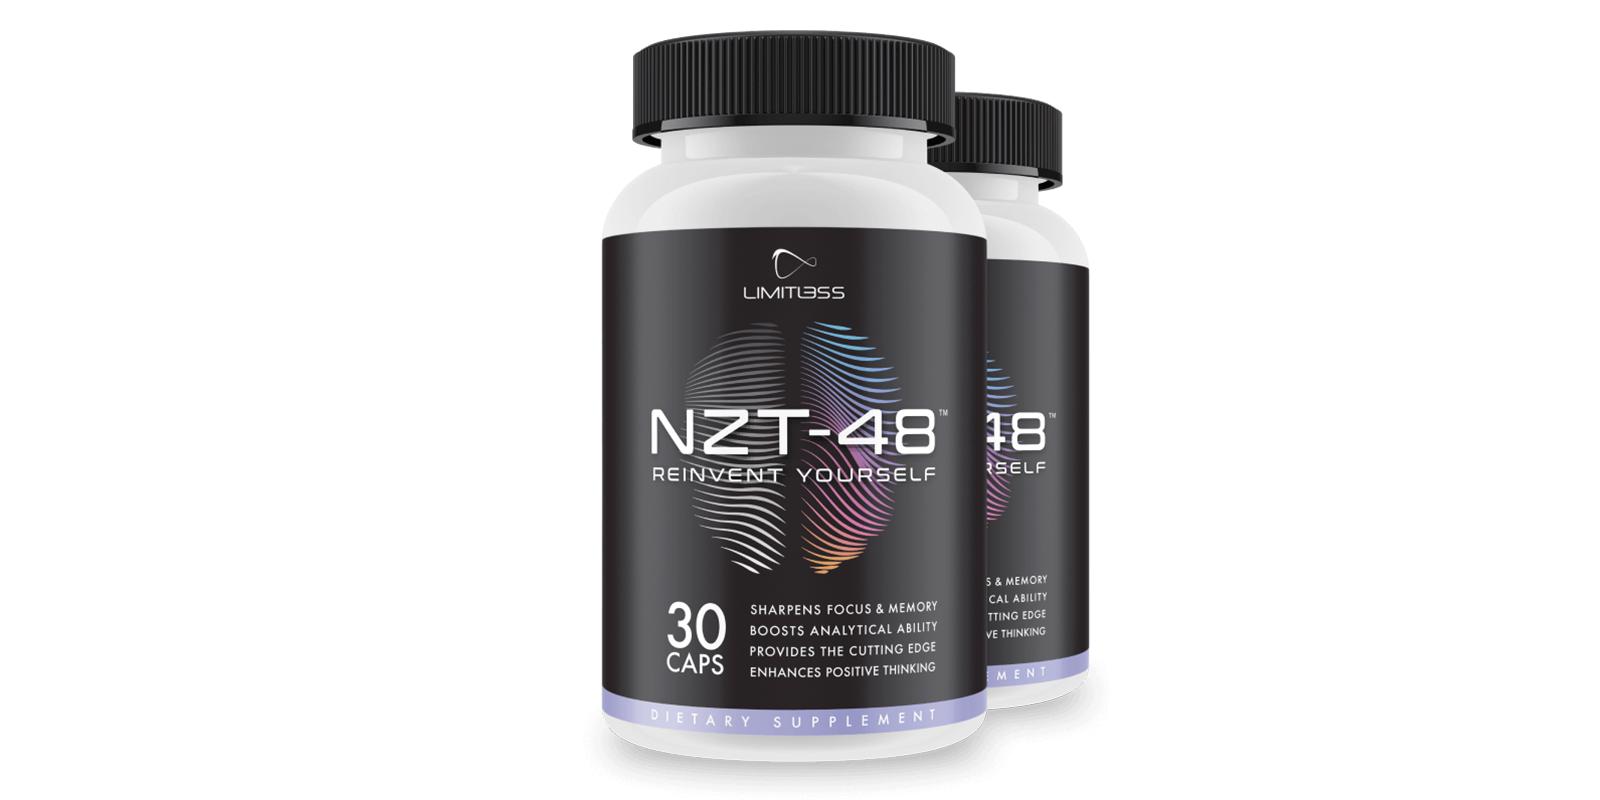 Brain-NZT-48-reviews-2